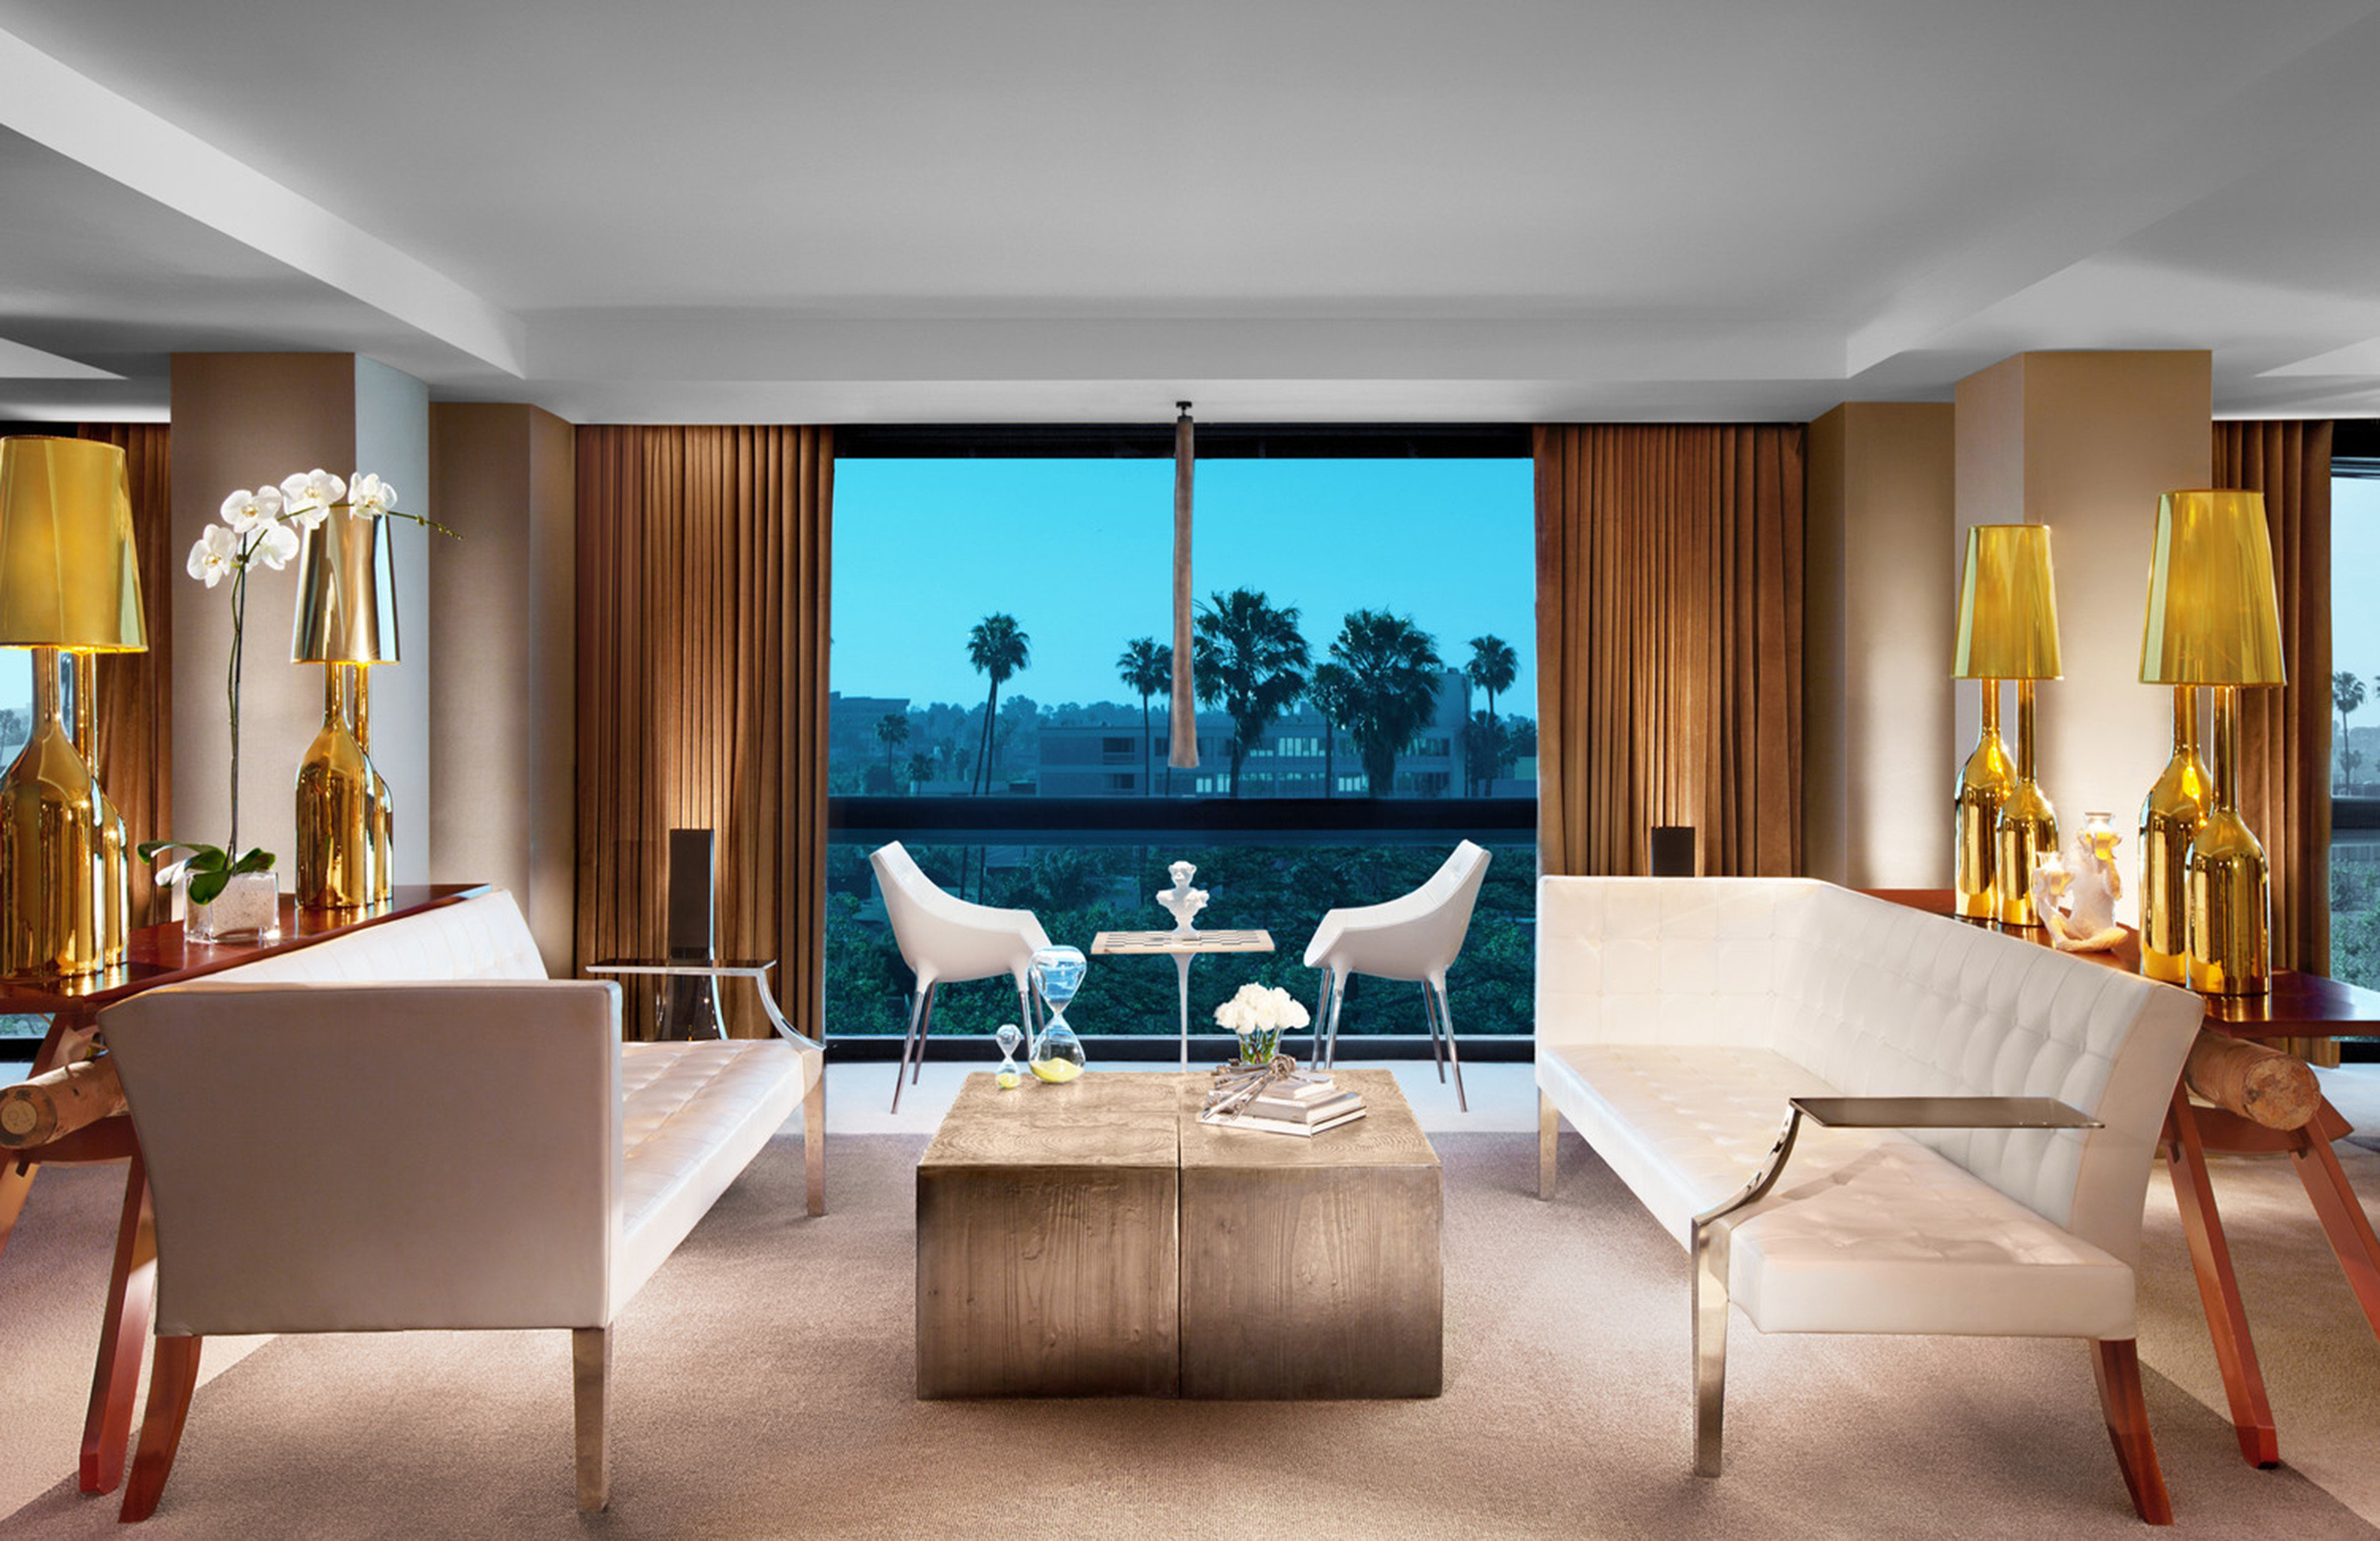 City Elegant Hotels Lounge Modern Trip Ideas property chair living room Suite home Bedroom condominium Villa